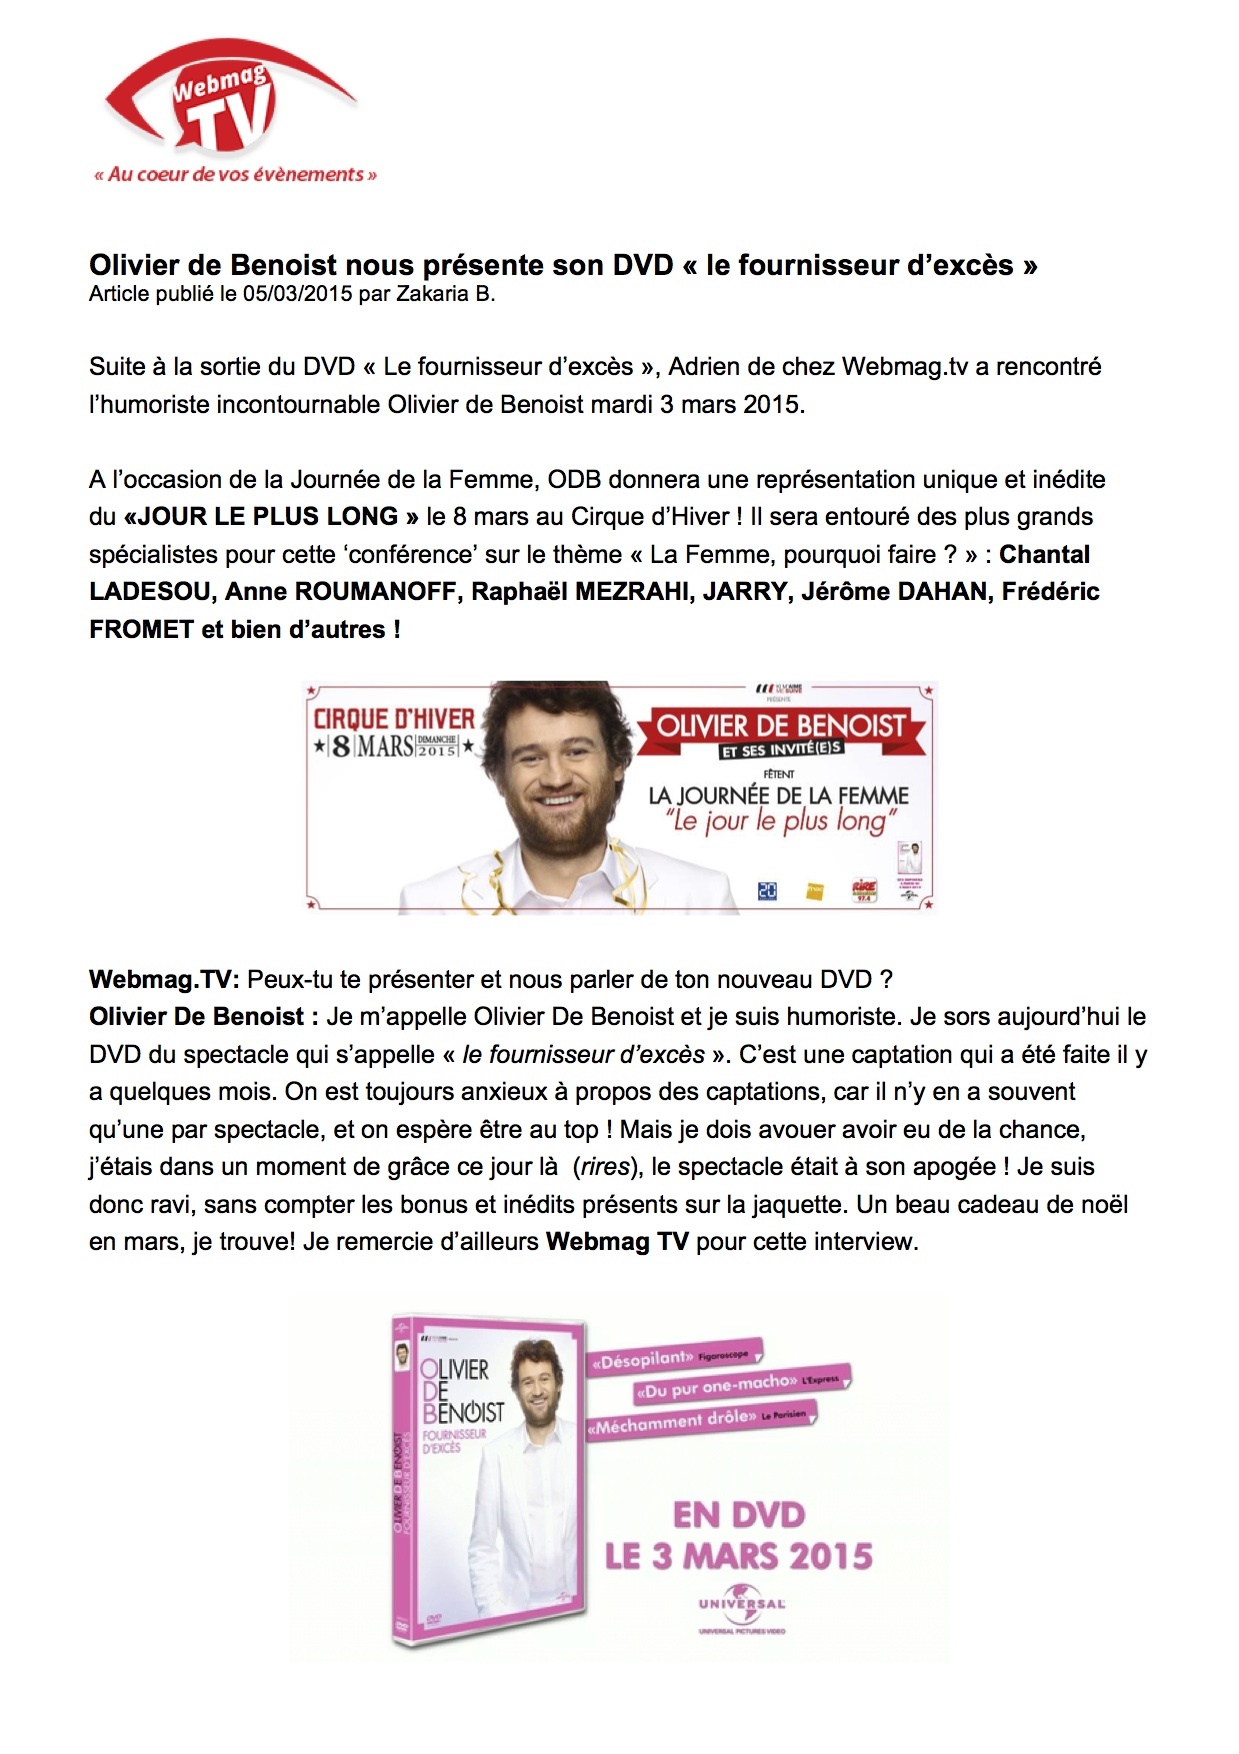 Webmag TV p1 - 05.03.15